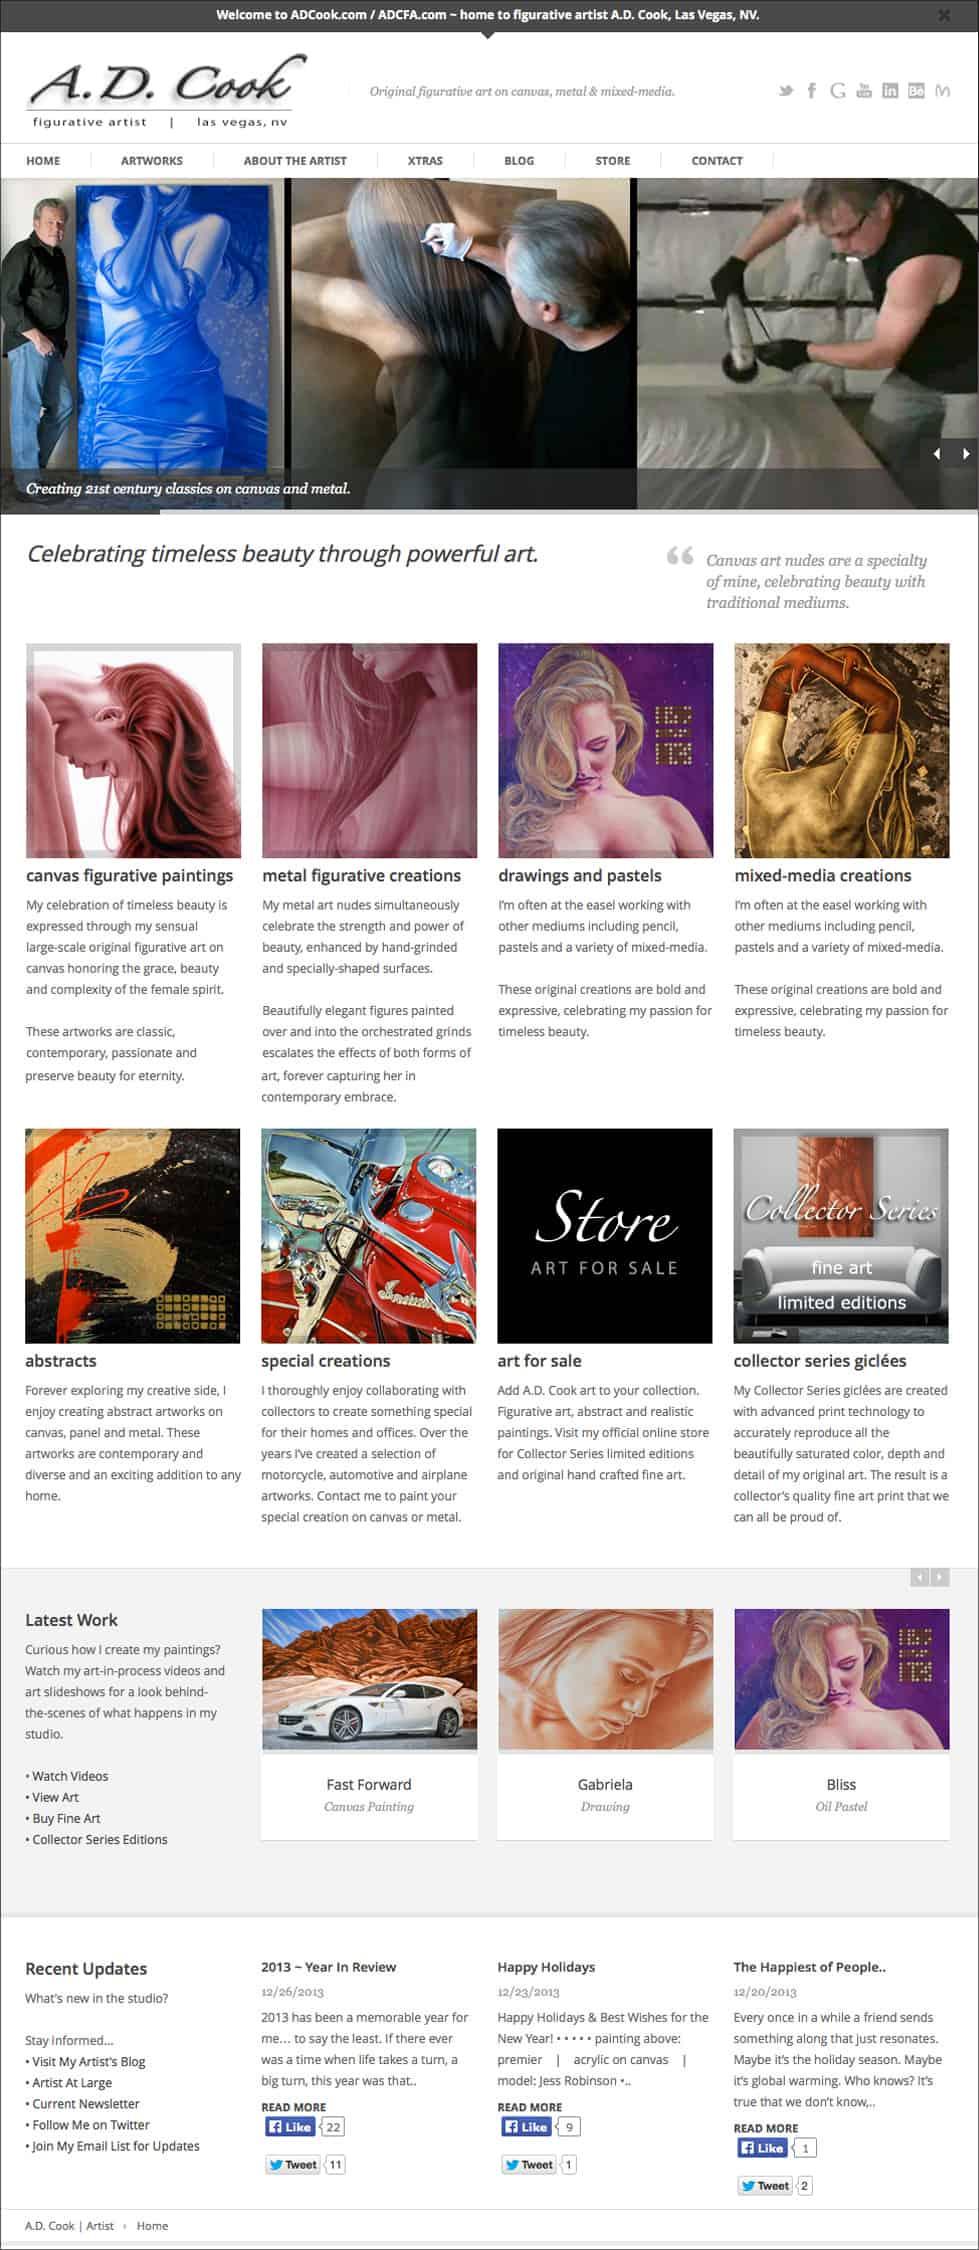 ADCook.com Screenshot - January 2014